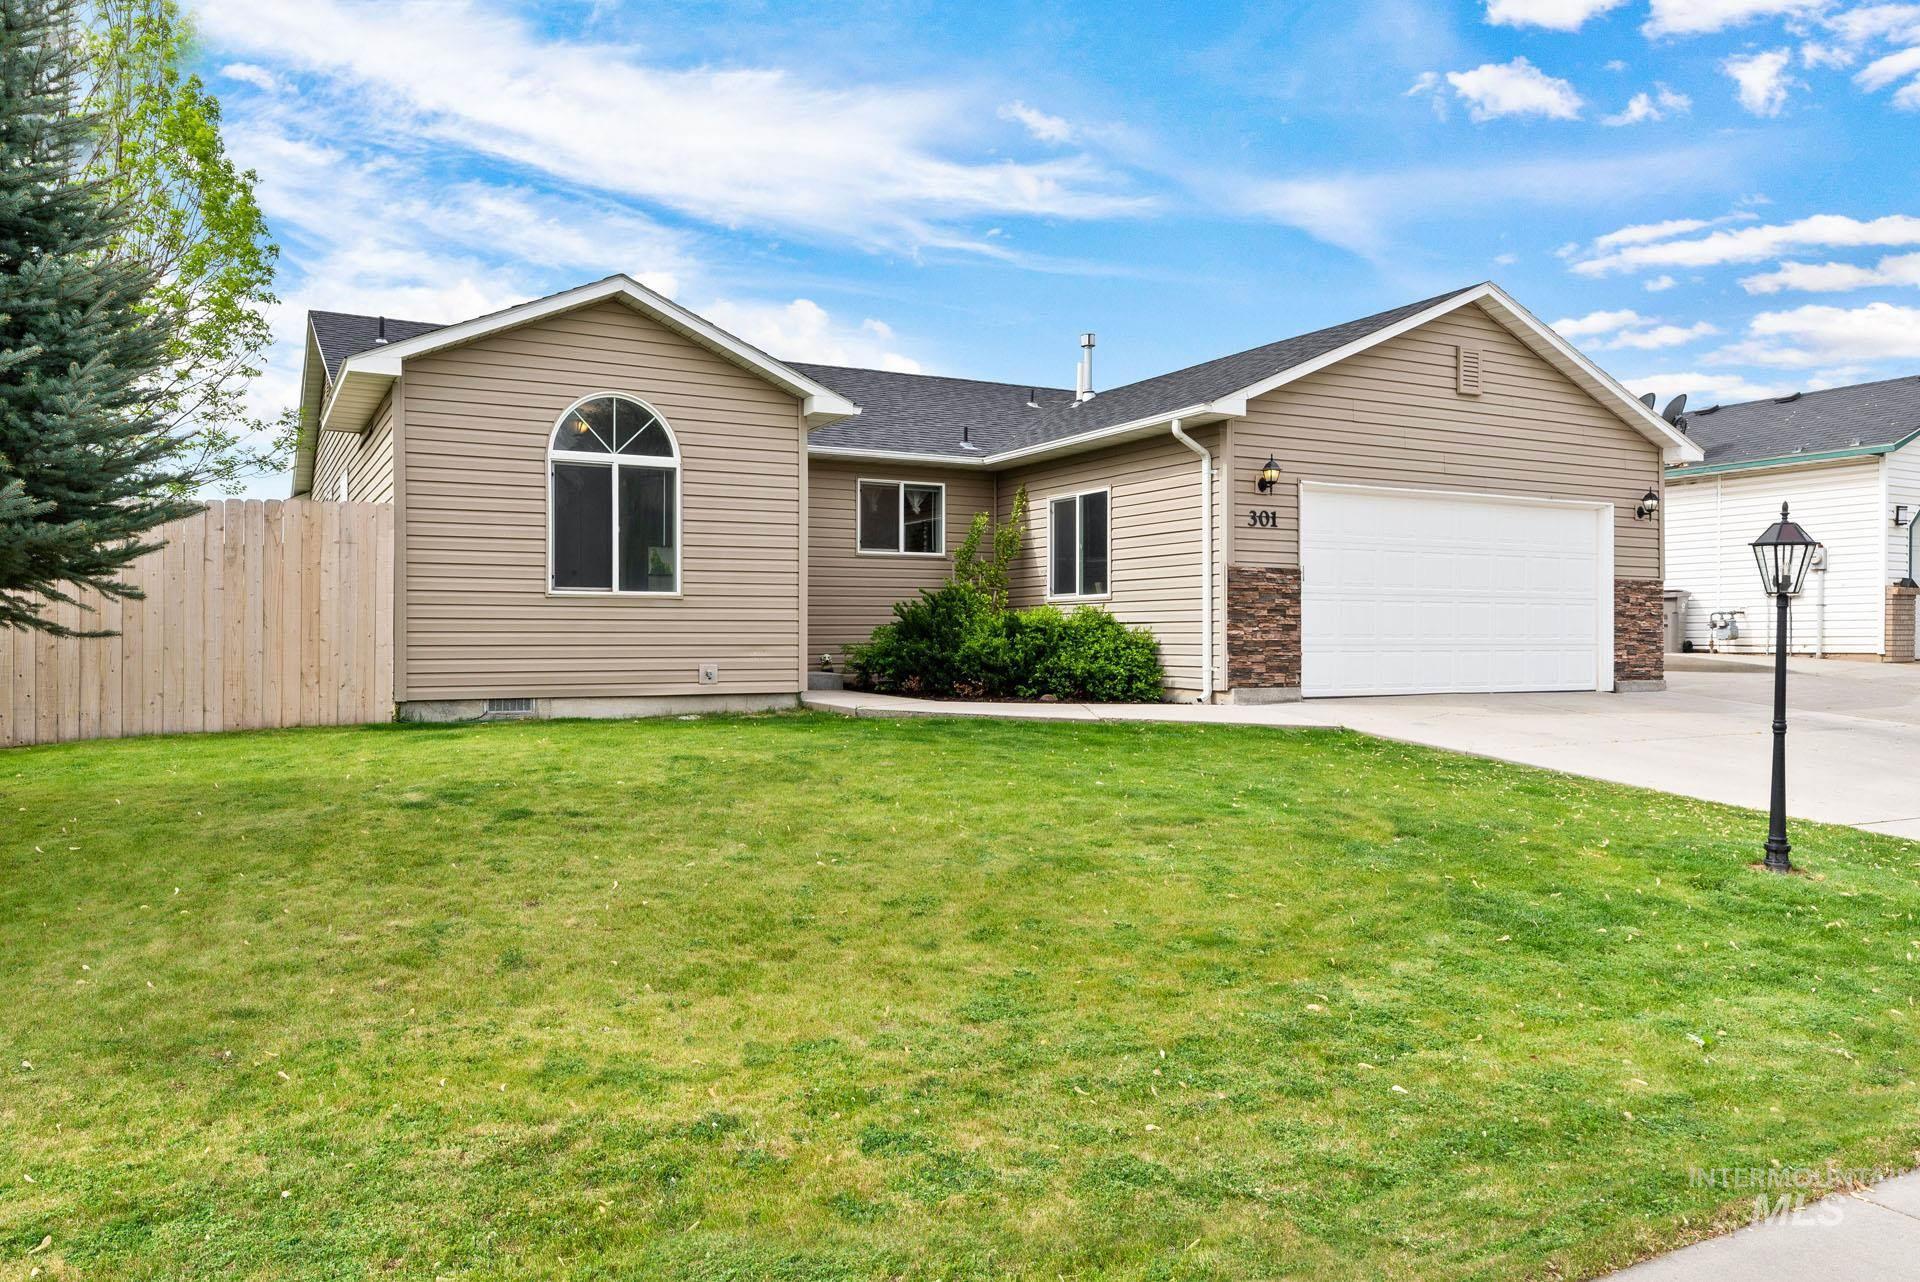 301 SUNRIDGE DR Property Photo - Caldwell, ID real estate listing